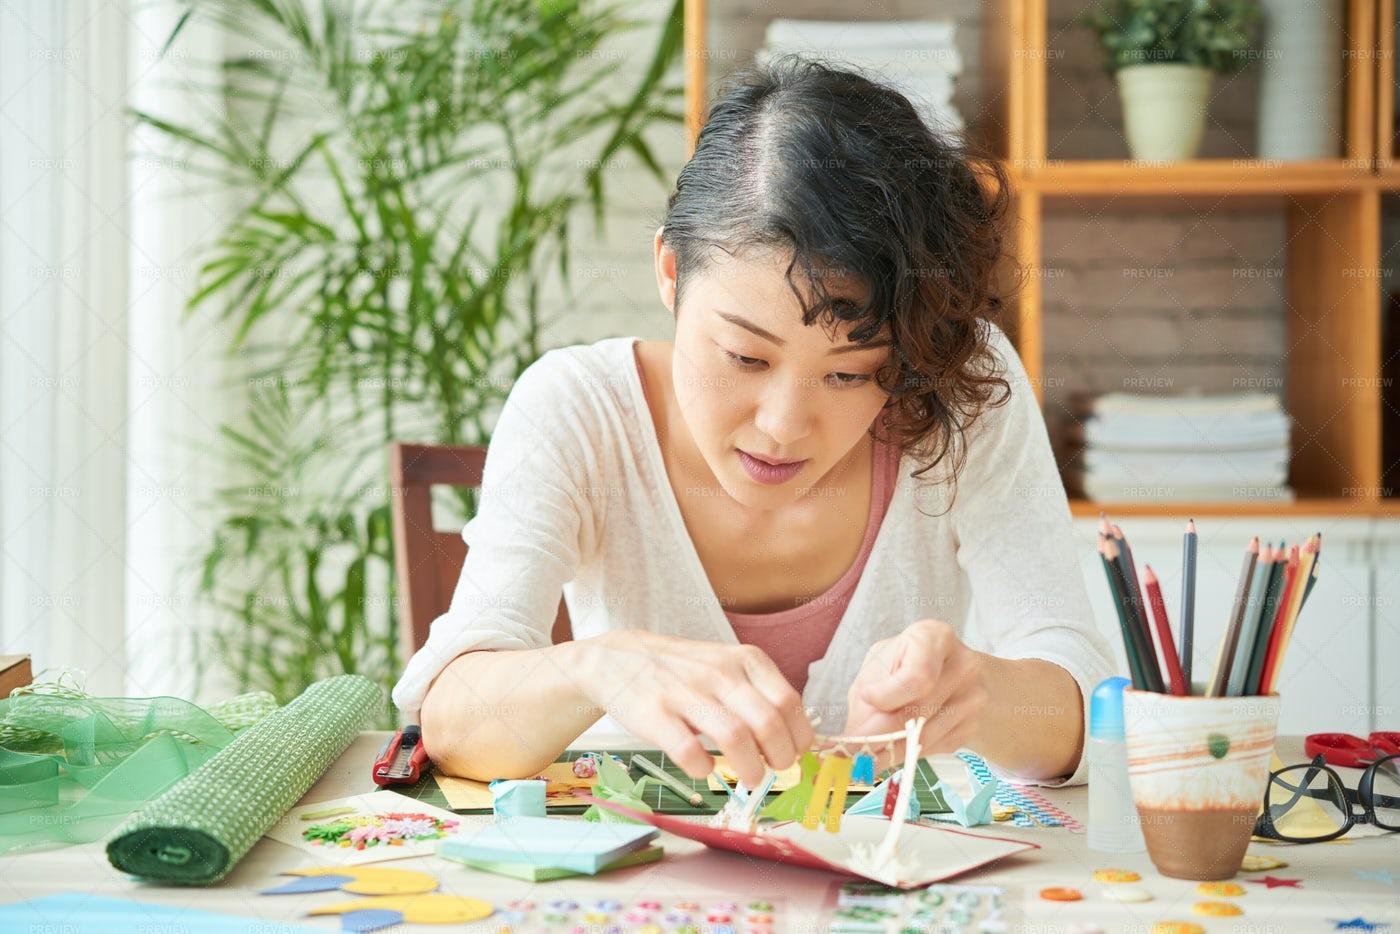 Japanese Woman Focused On...: Stock Photos